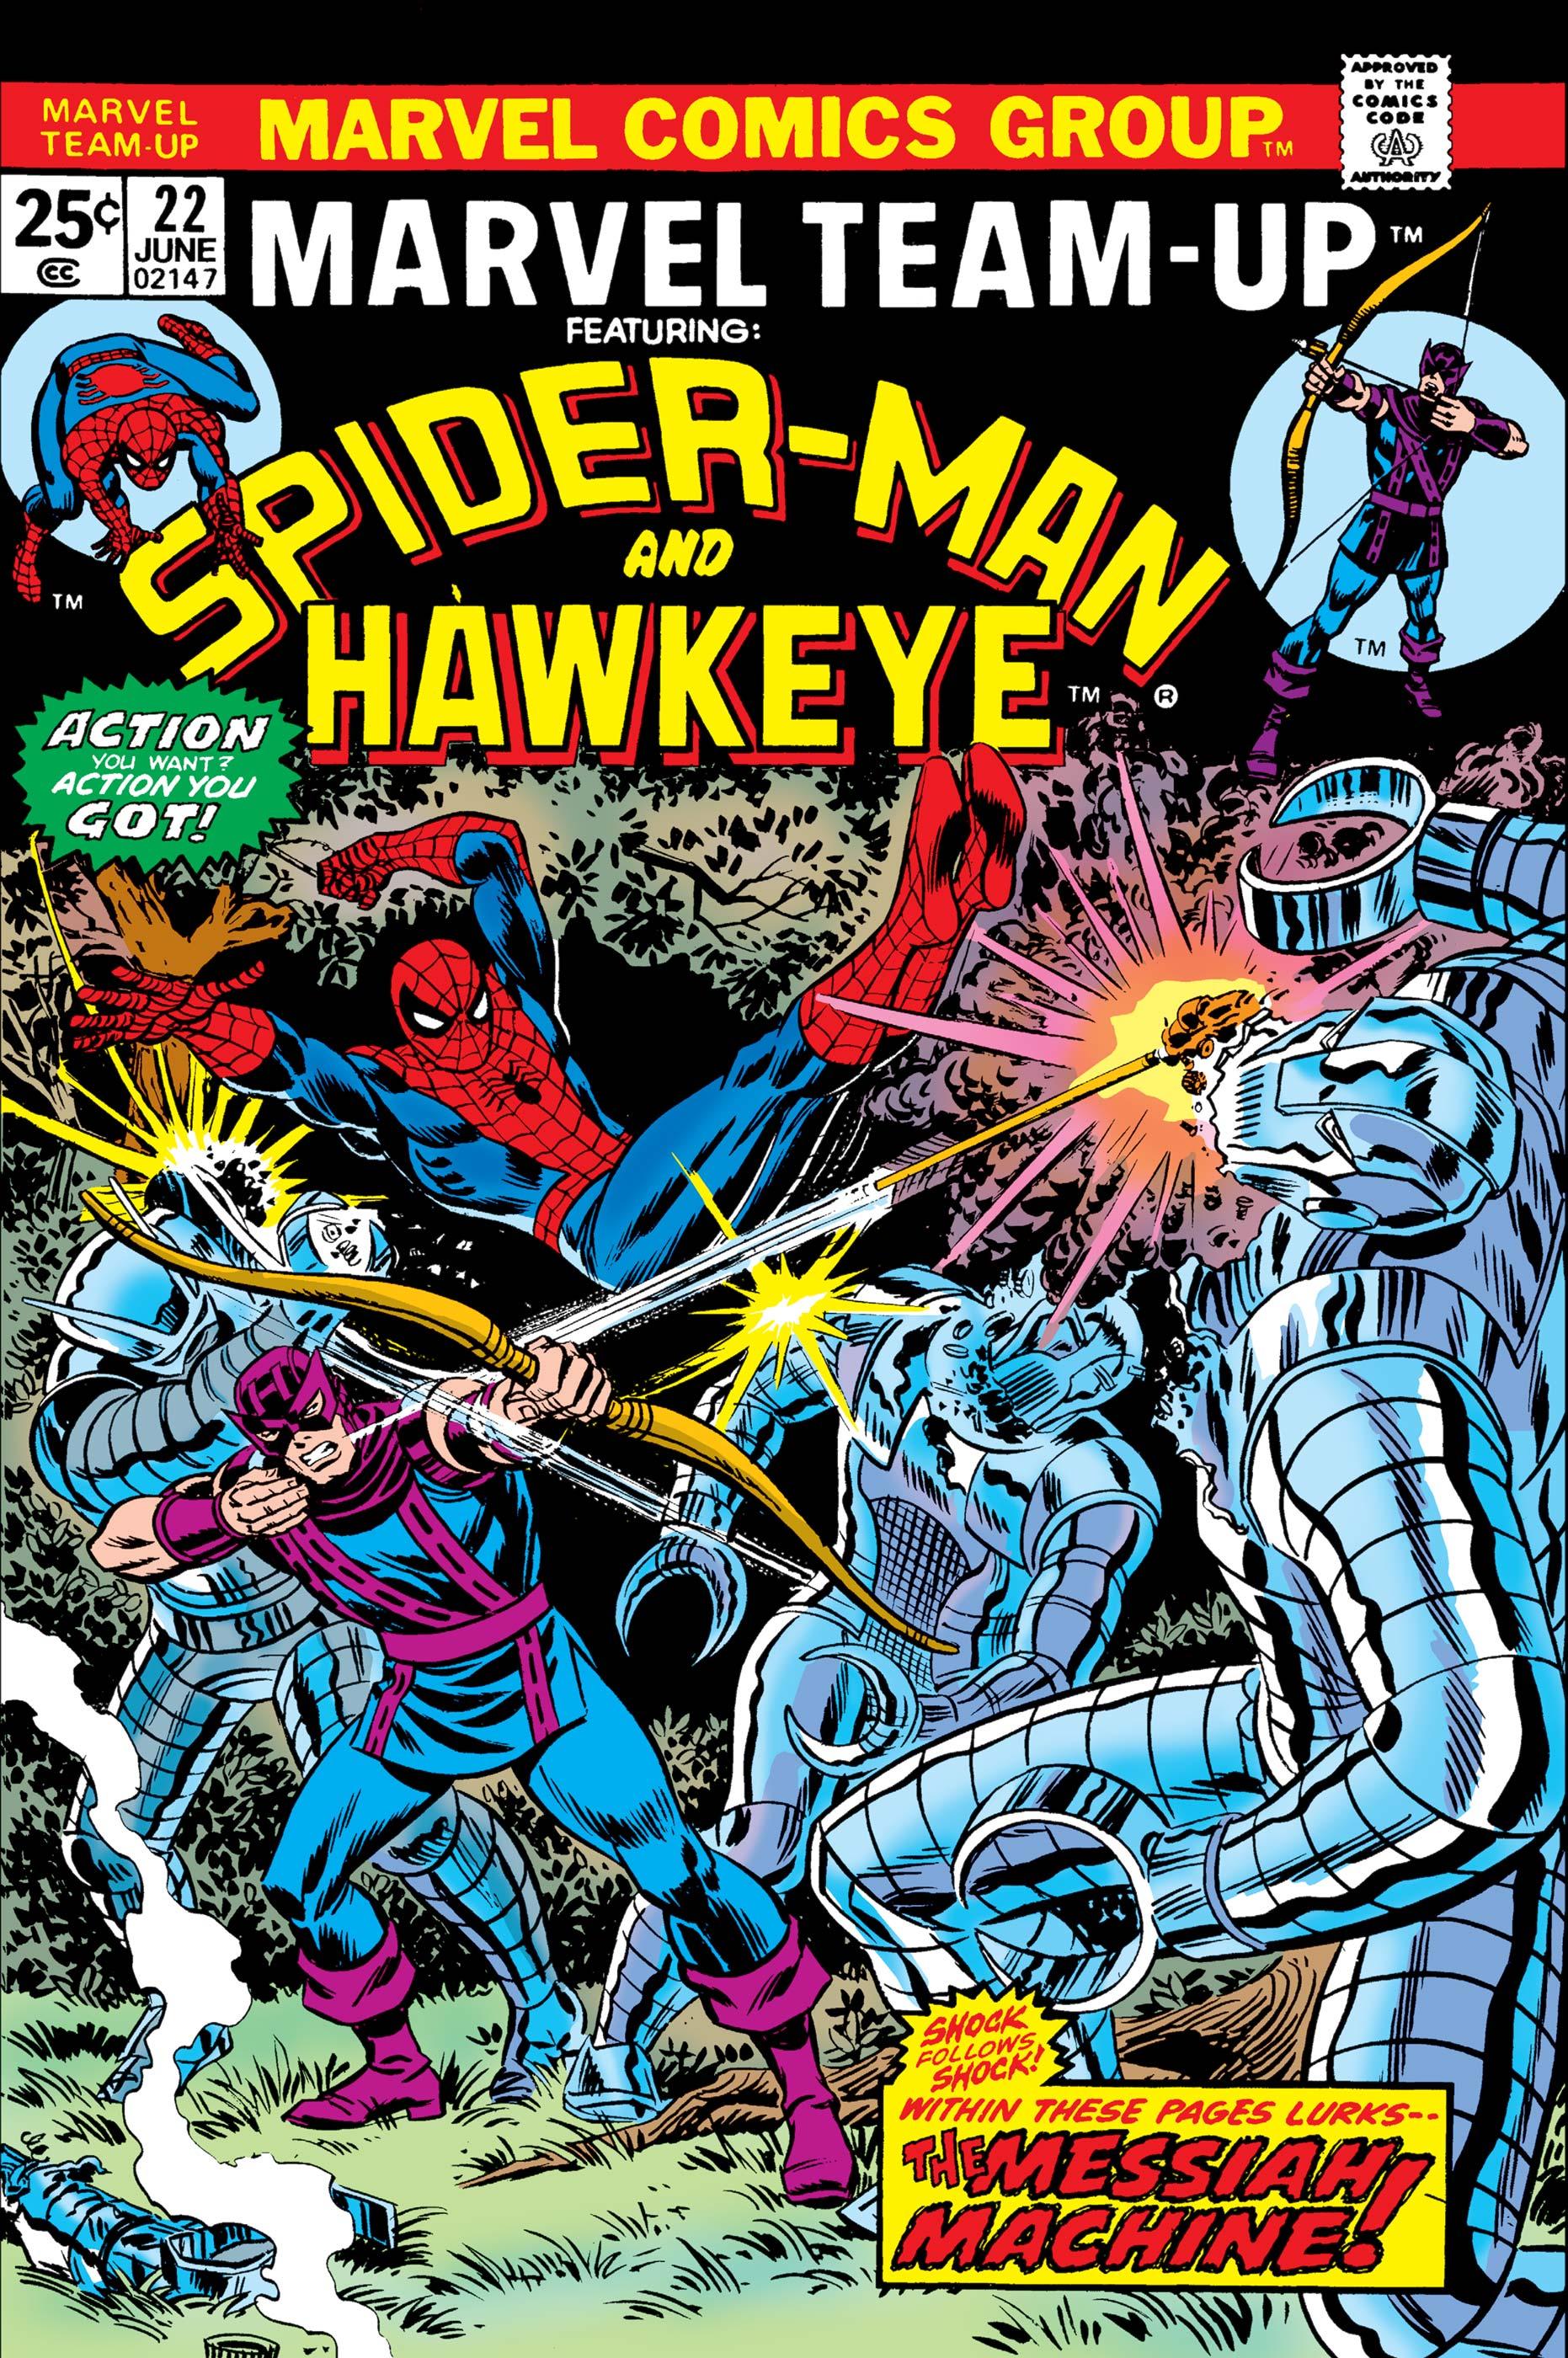 Marvel Team-Up (1972) #22